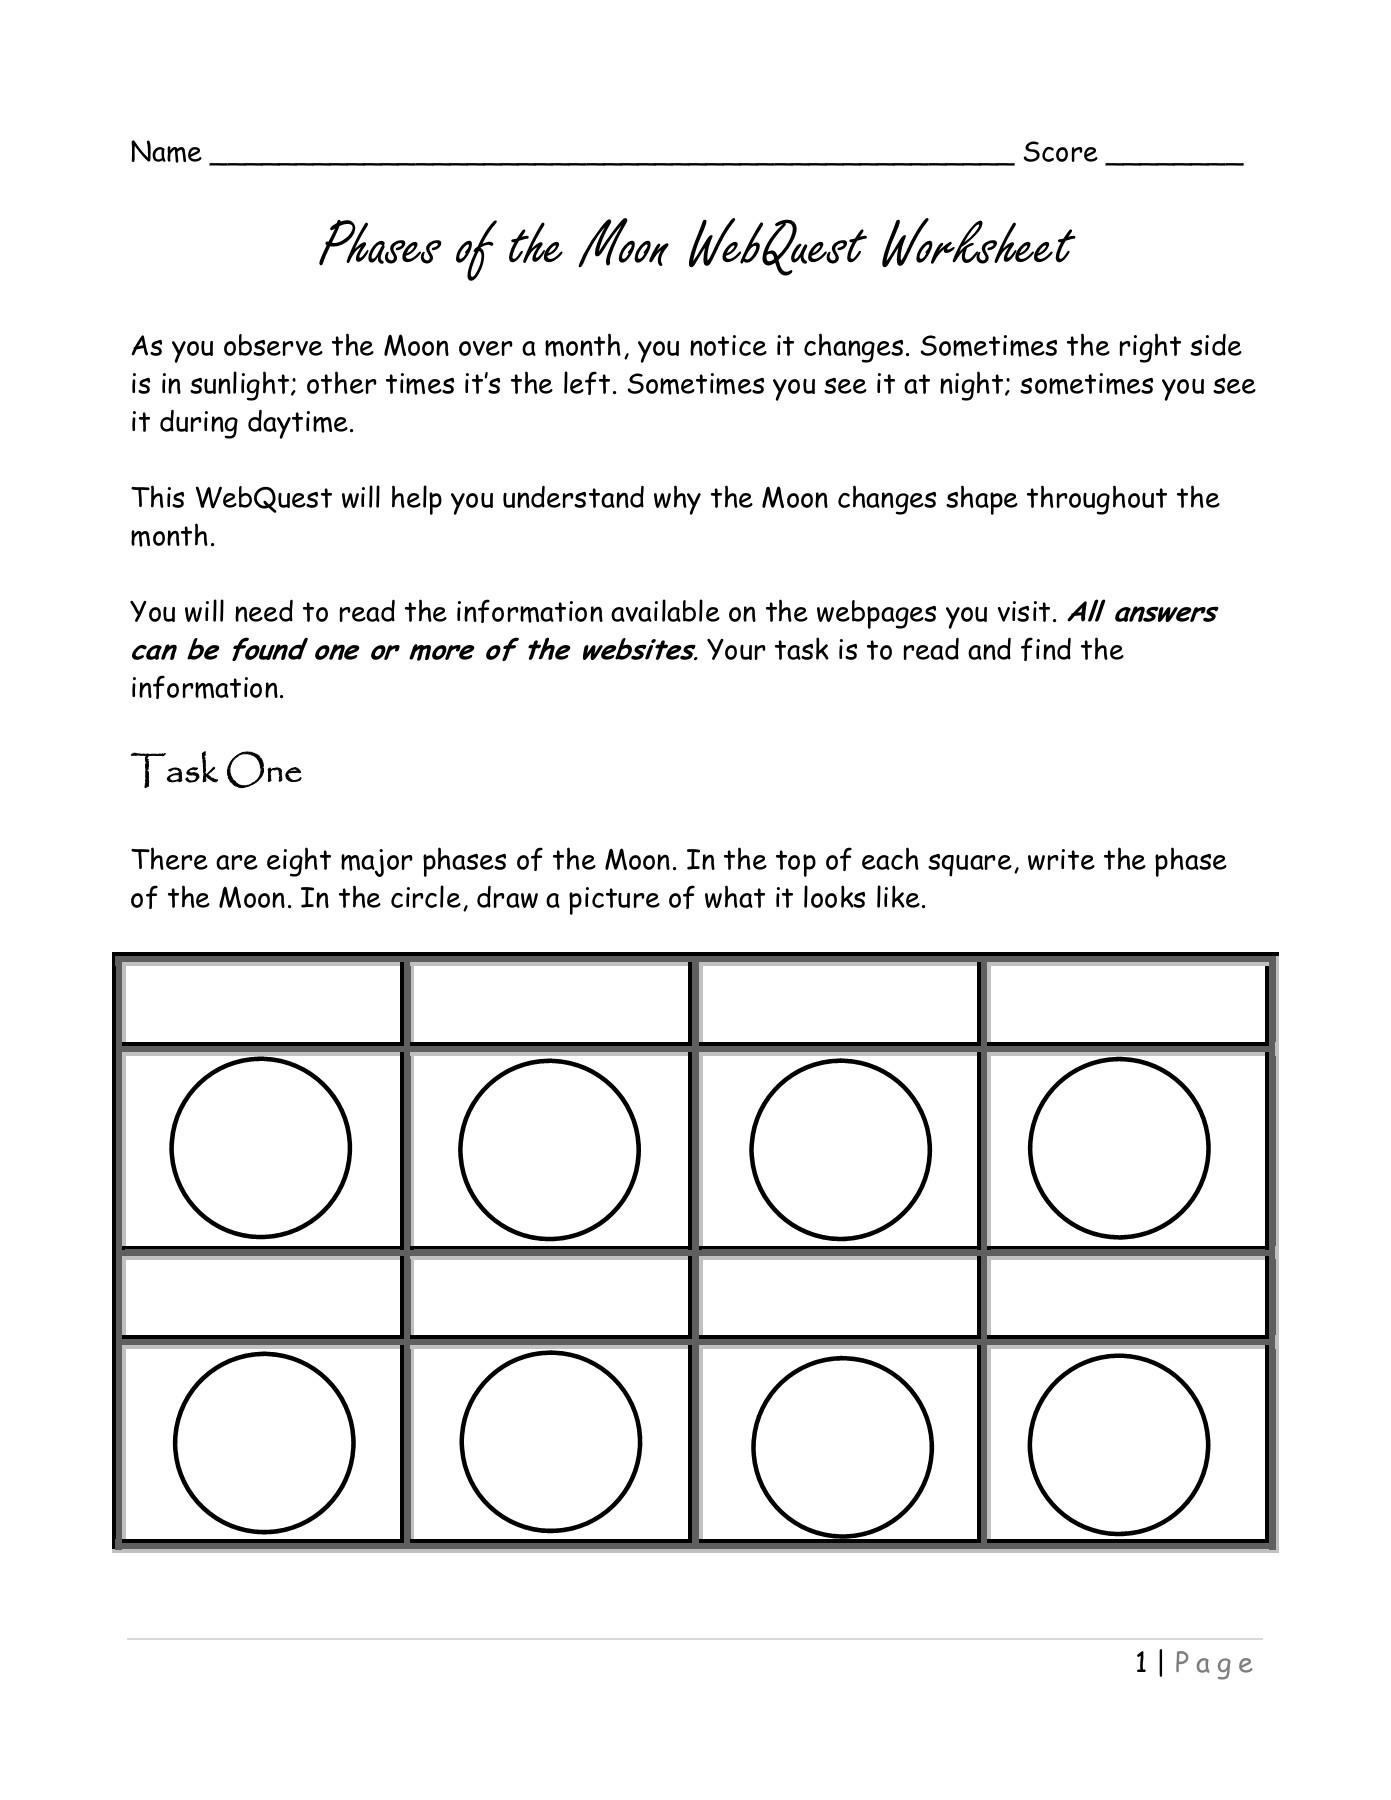 Moon Phases Worksheet Pdf Phases Of the Moon Webquest Worksheet Mrscienceut